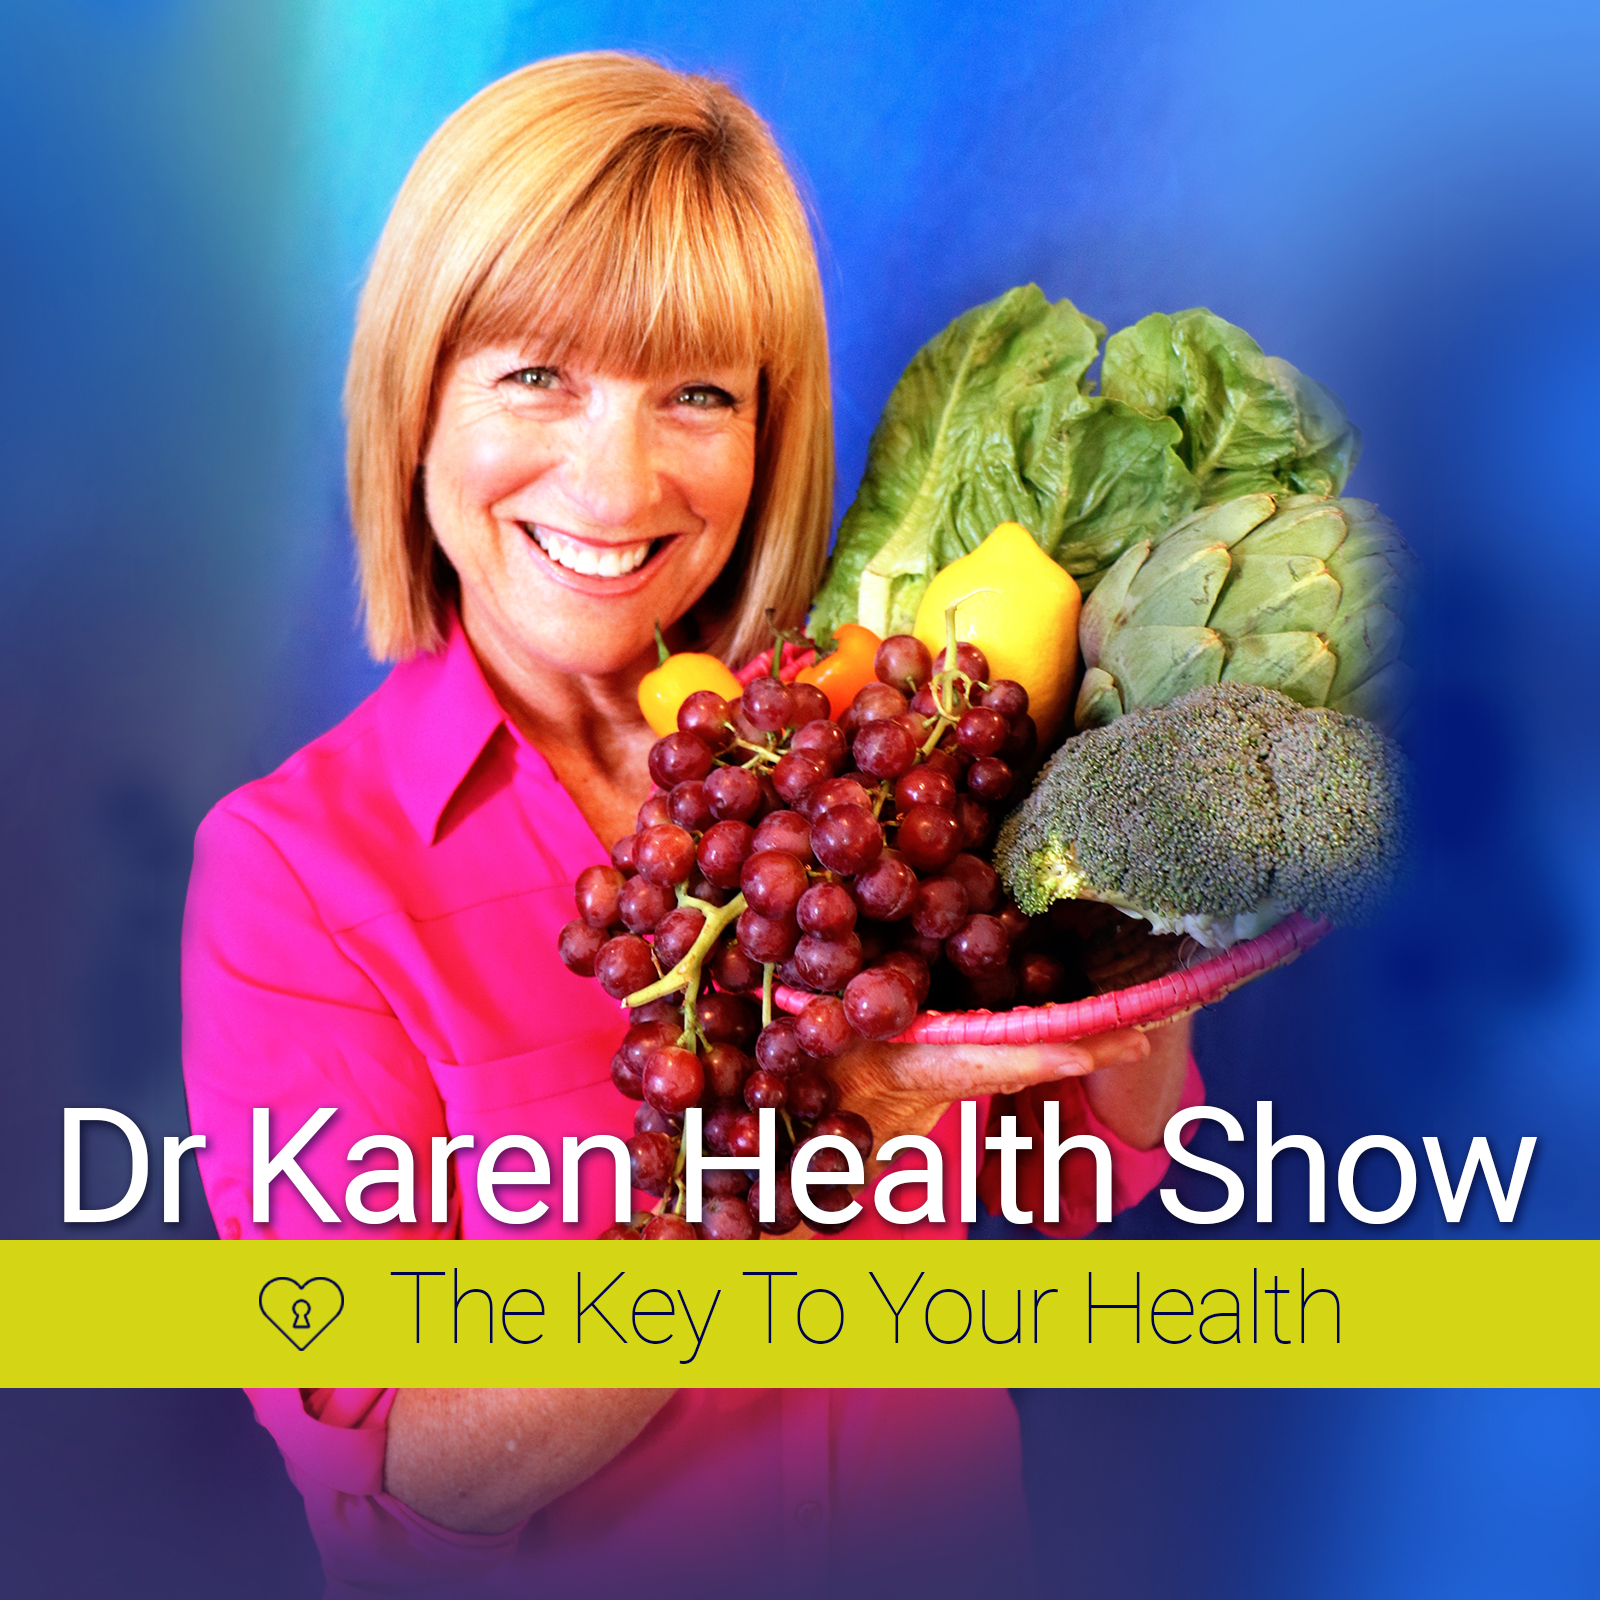 Dr Karen Health Show show image